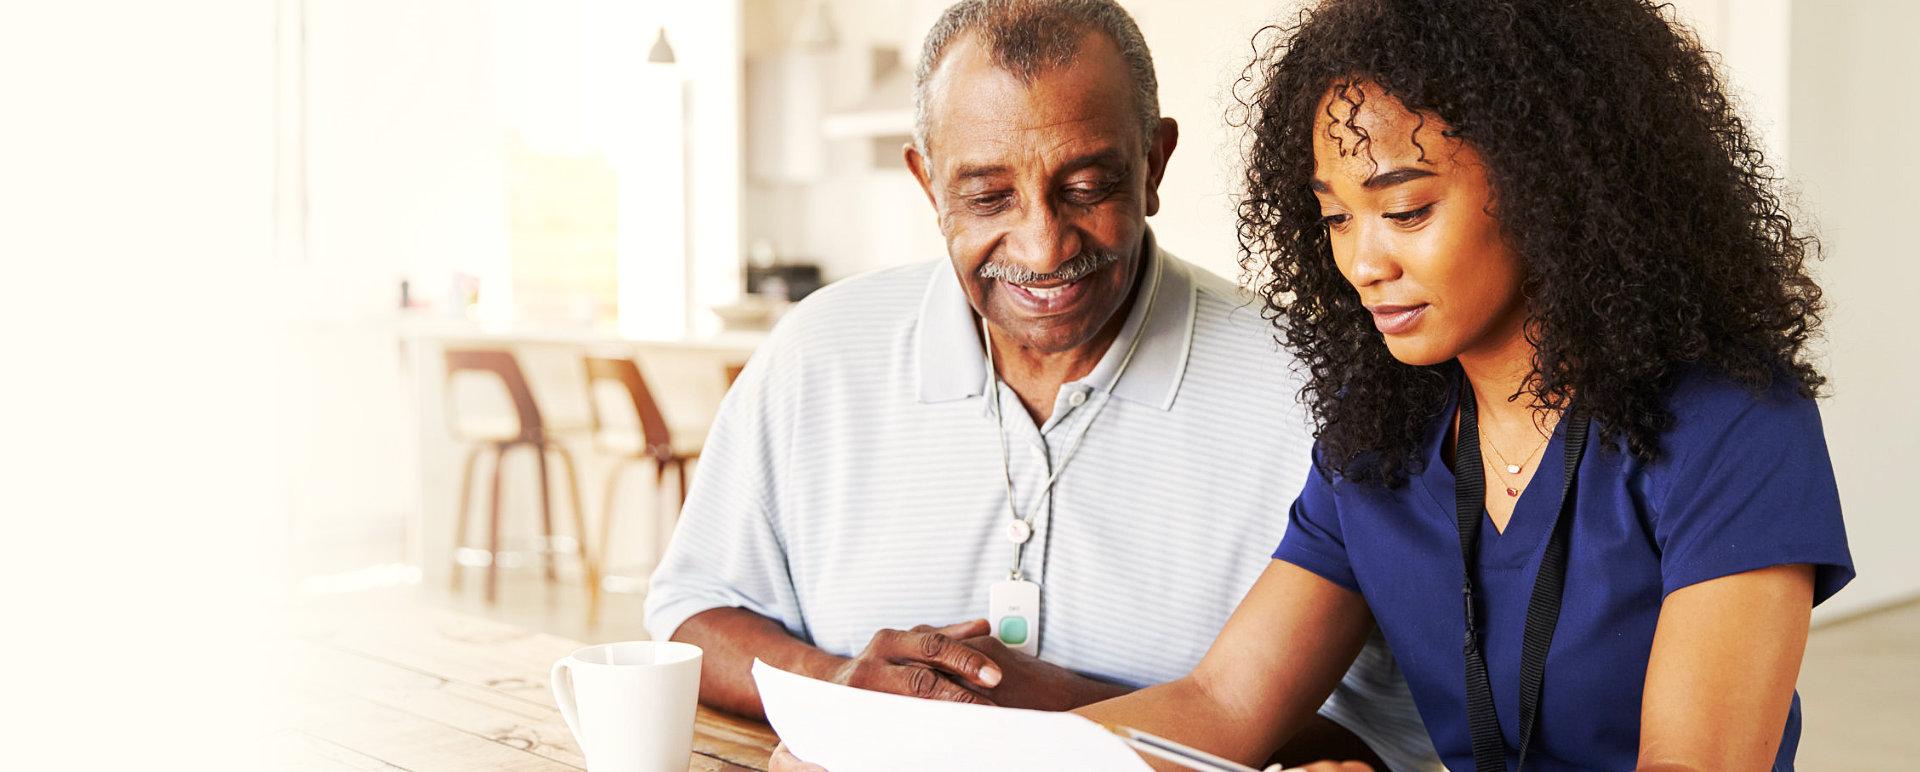 senior man and caregiver looking at paper